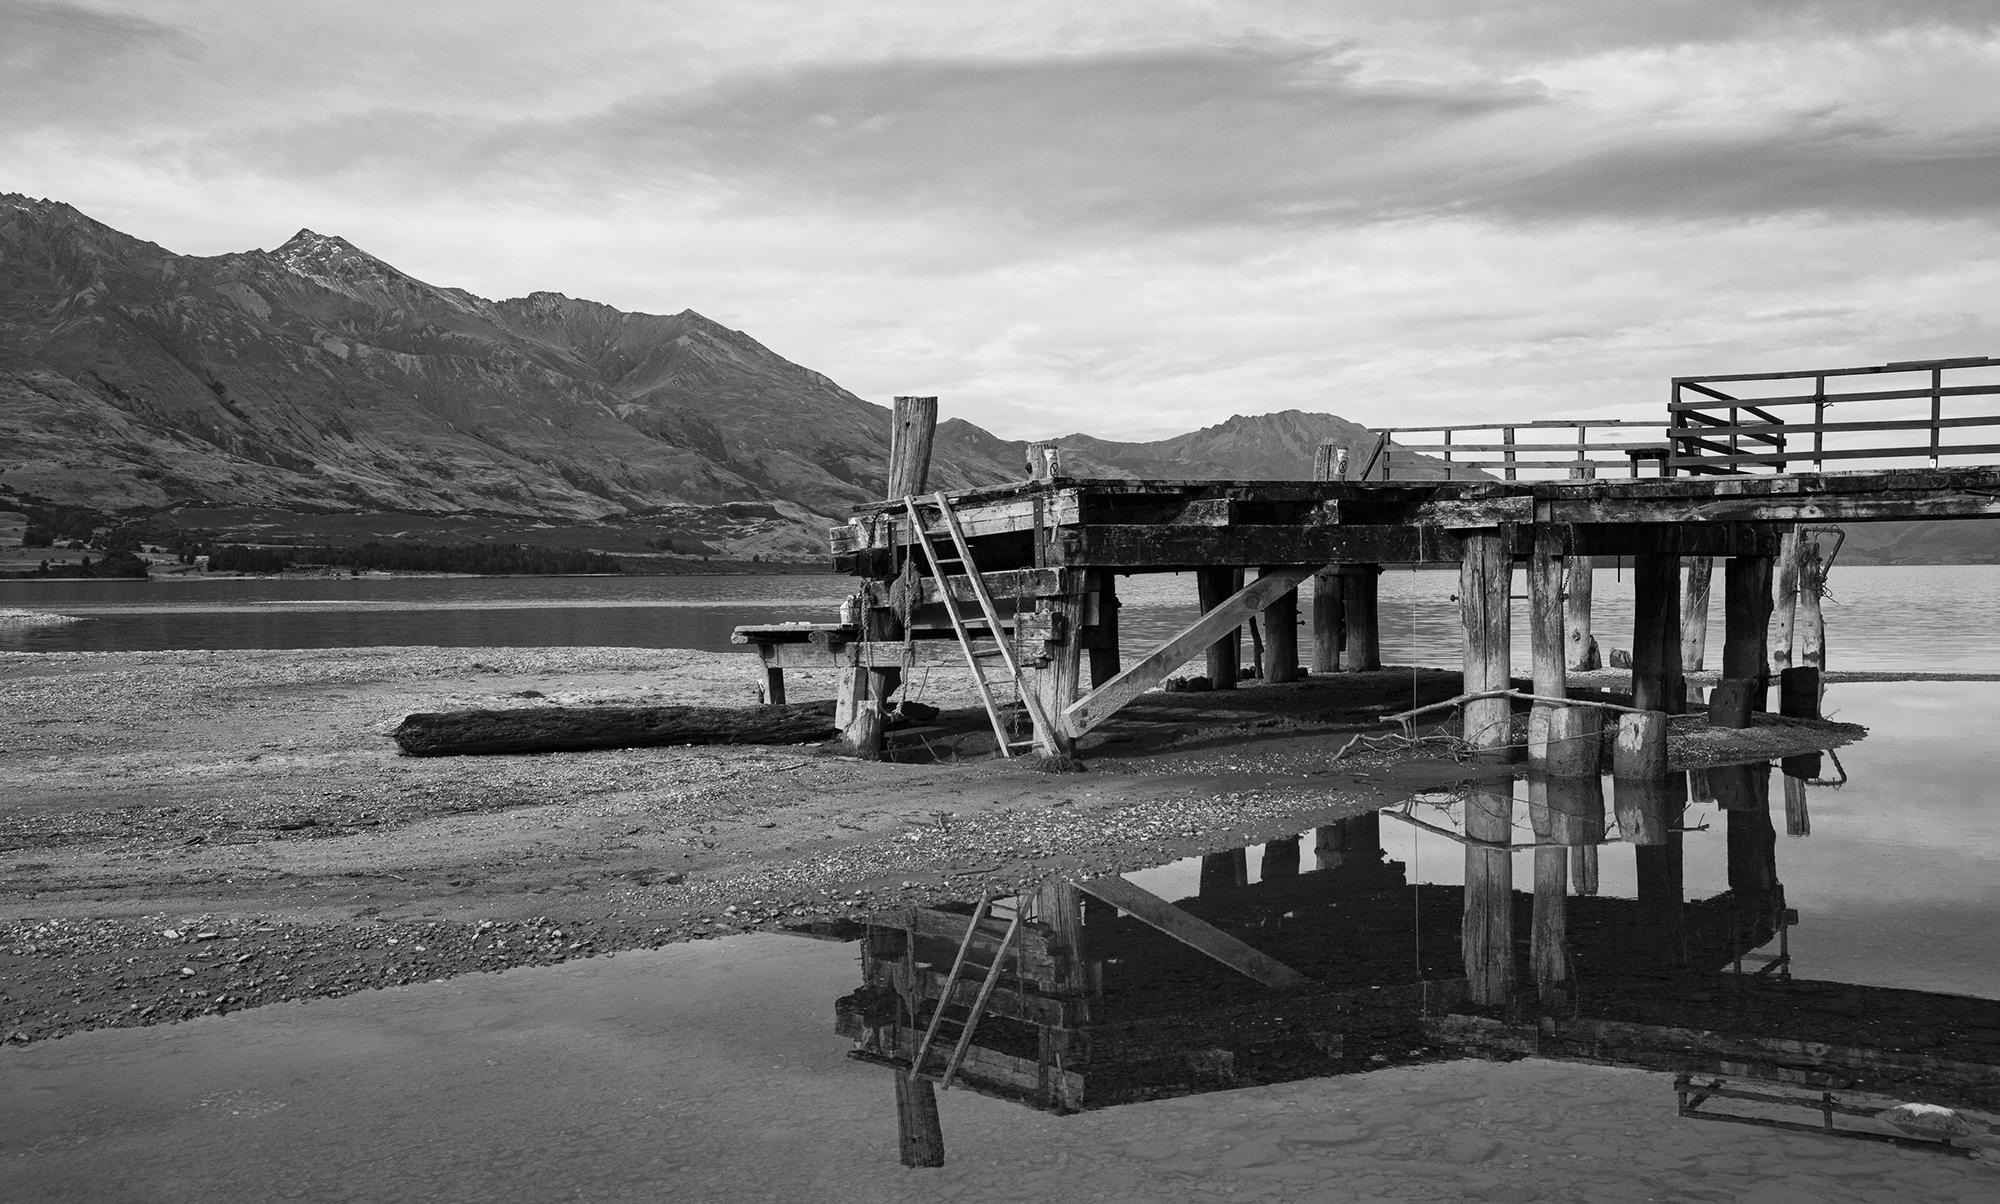 Glenorchy, NZ ii